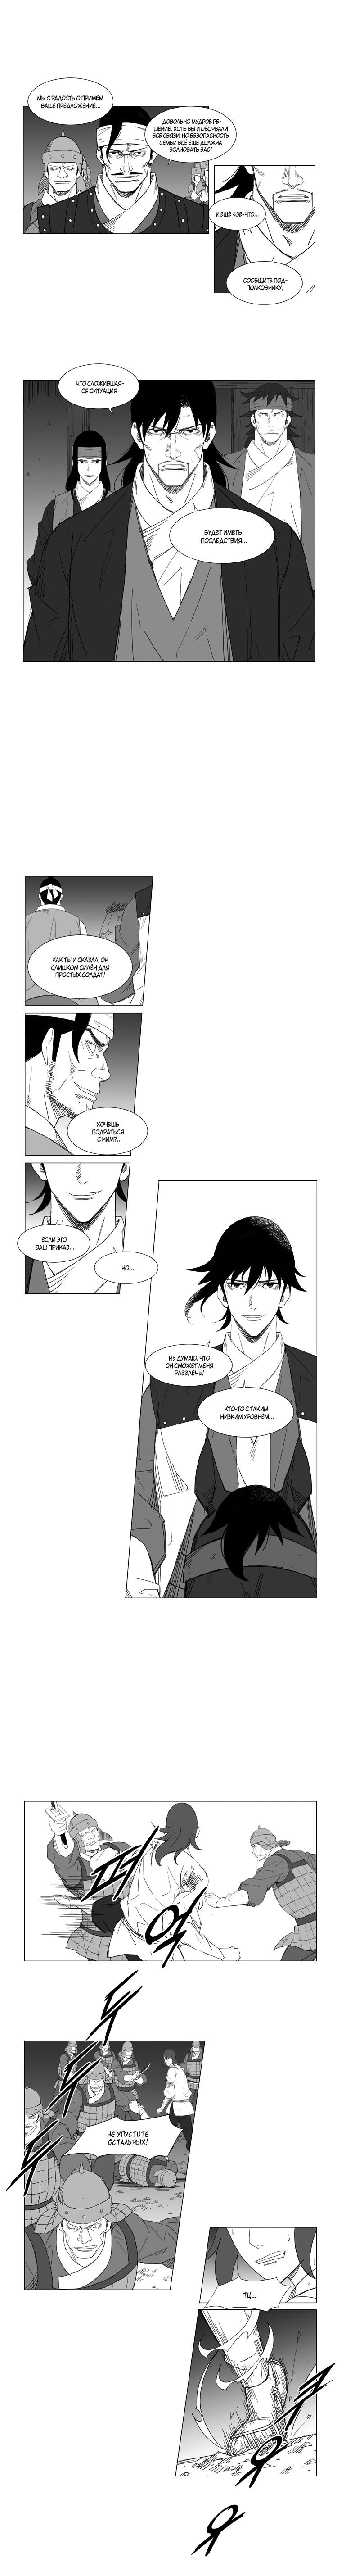 https://r1.ninemanga.com/comics/pic2/39/28263/317432/1485716717675.jpg Page 2